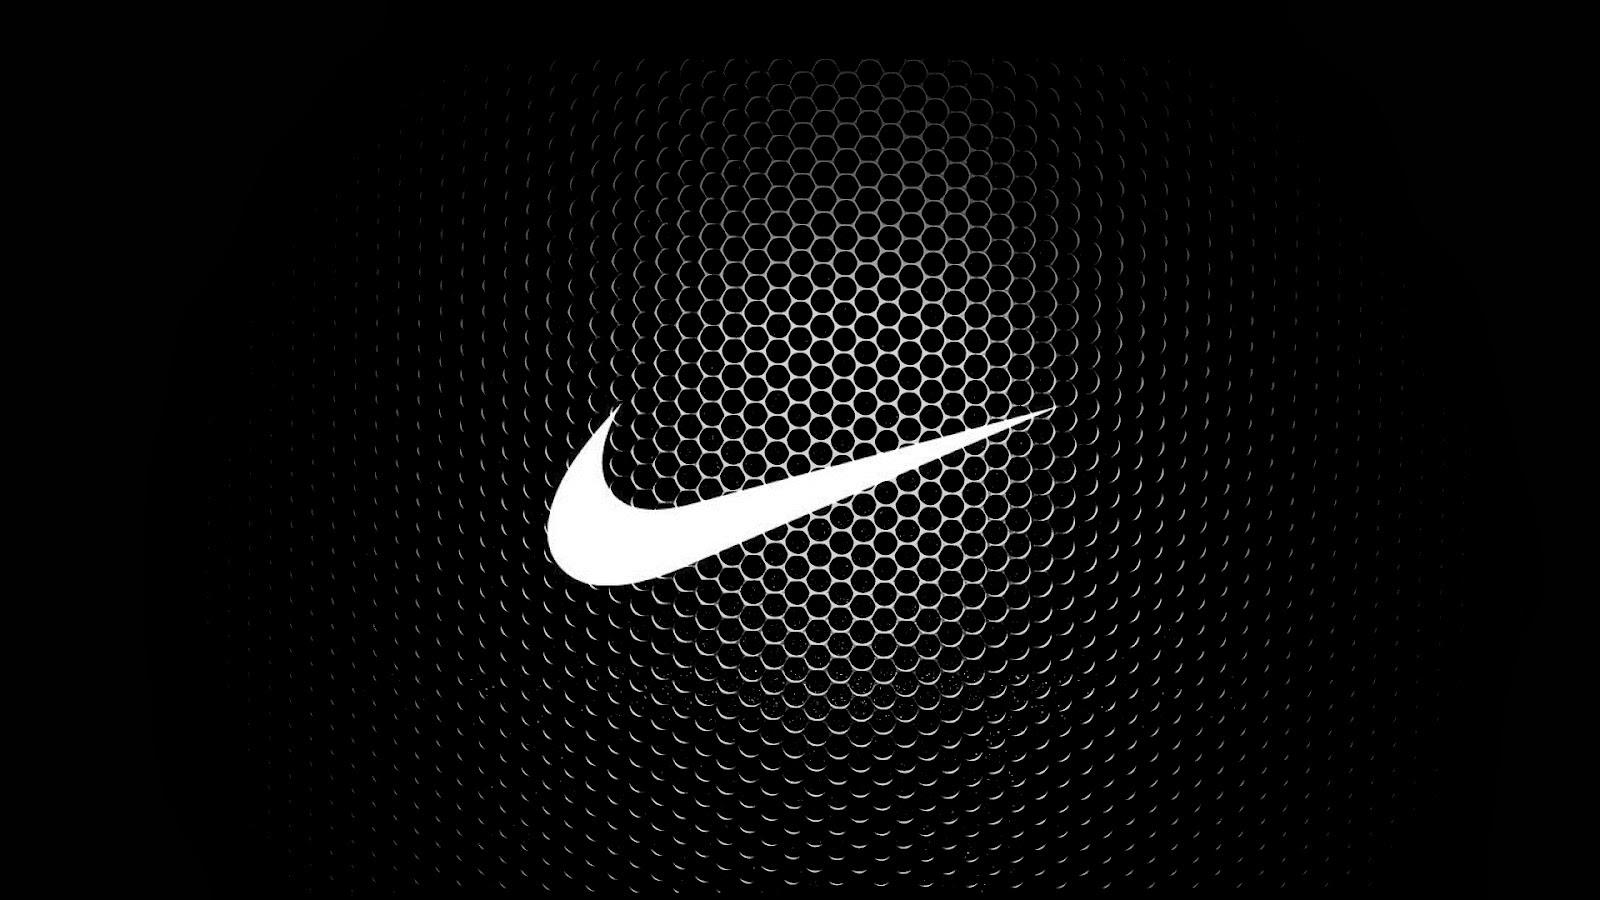 La reconocida marca de ropa deportiva http//www.nike.com/language_tunnel